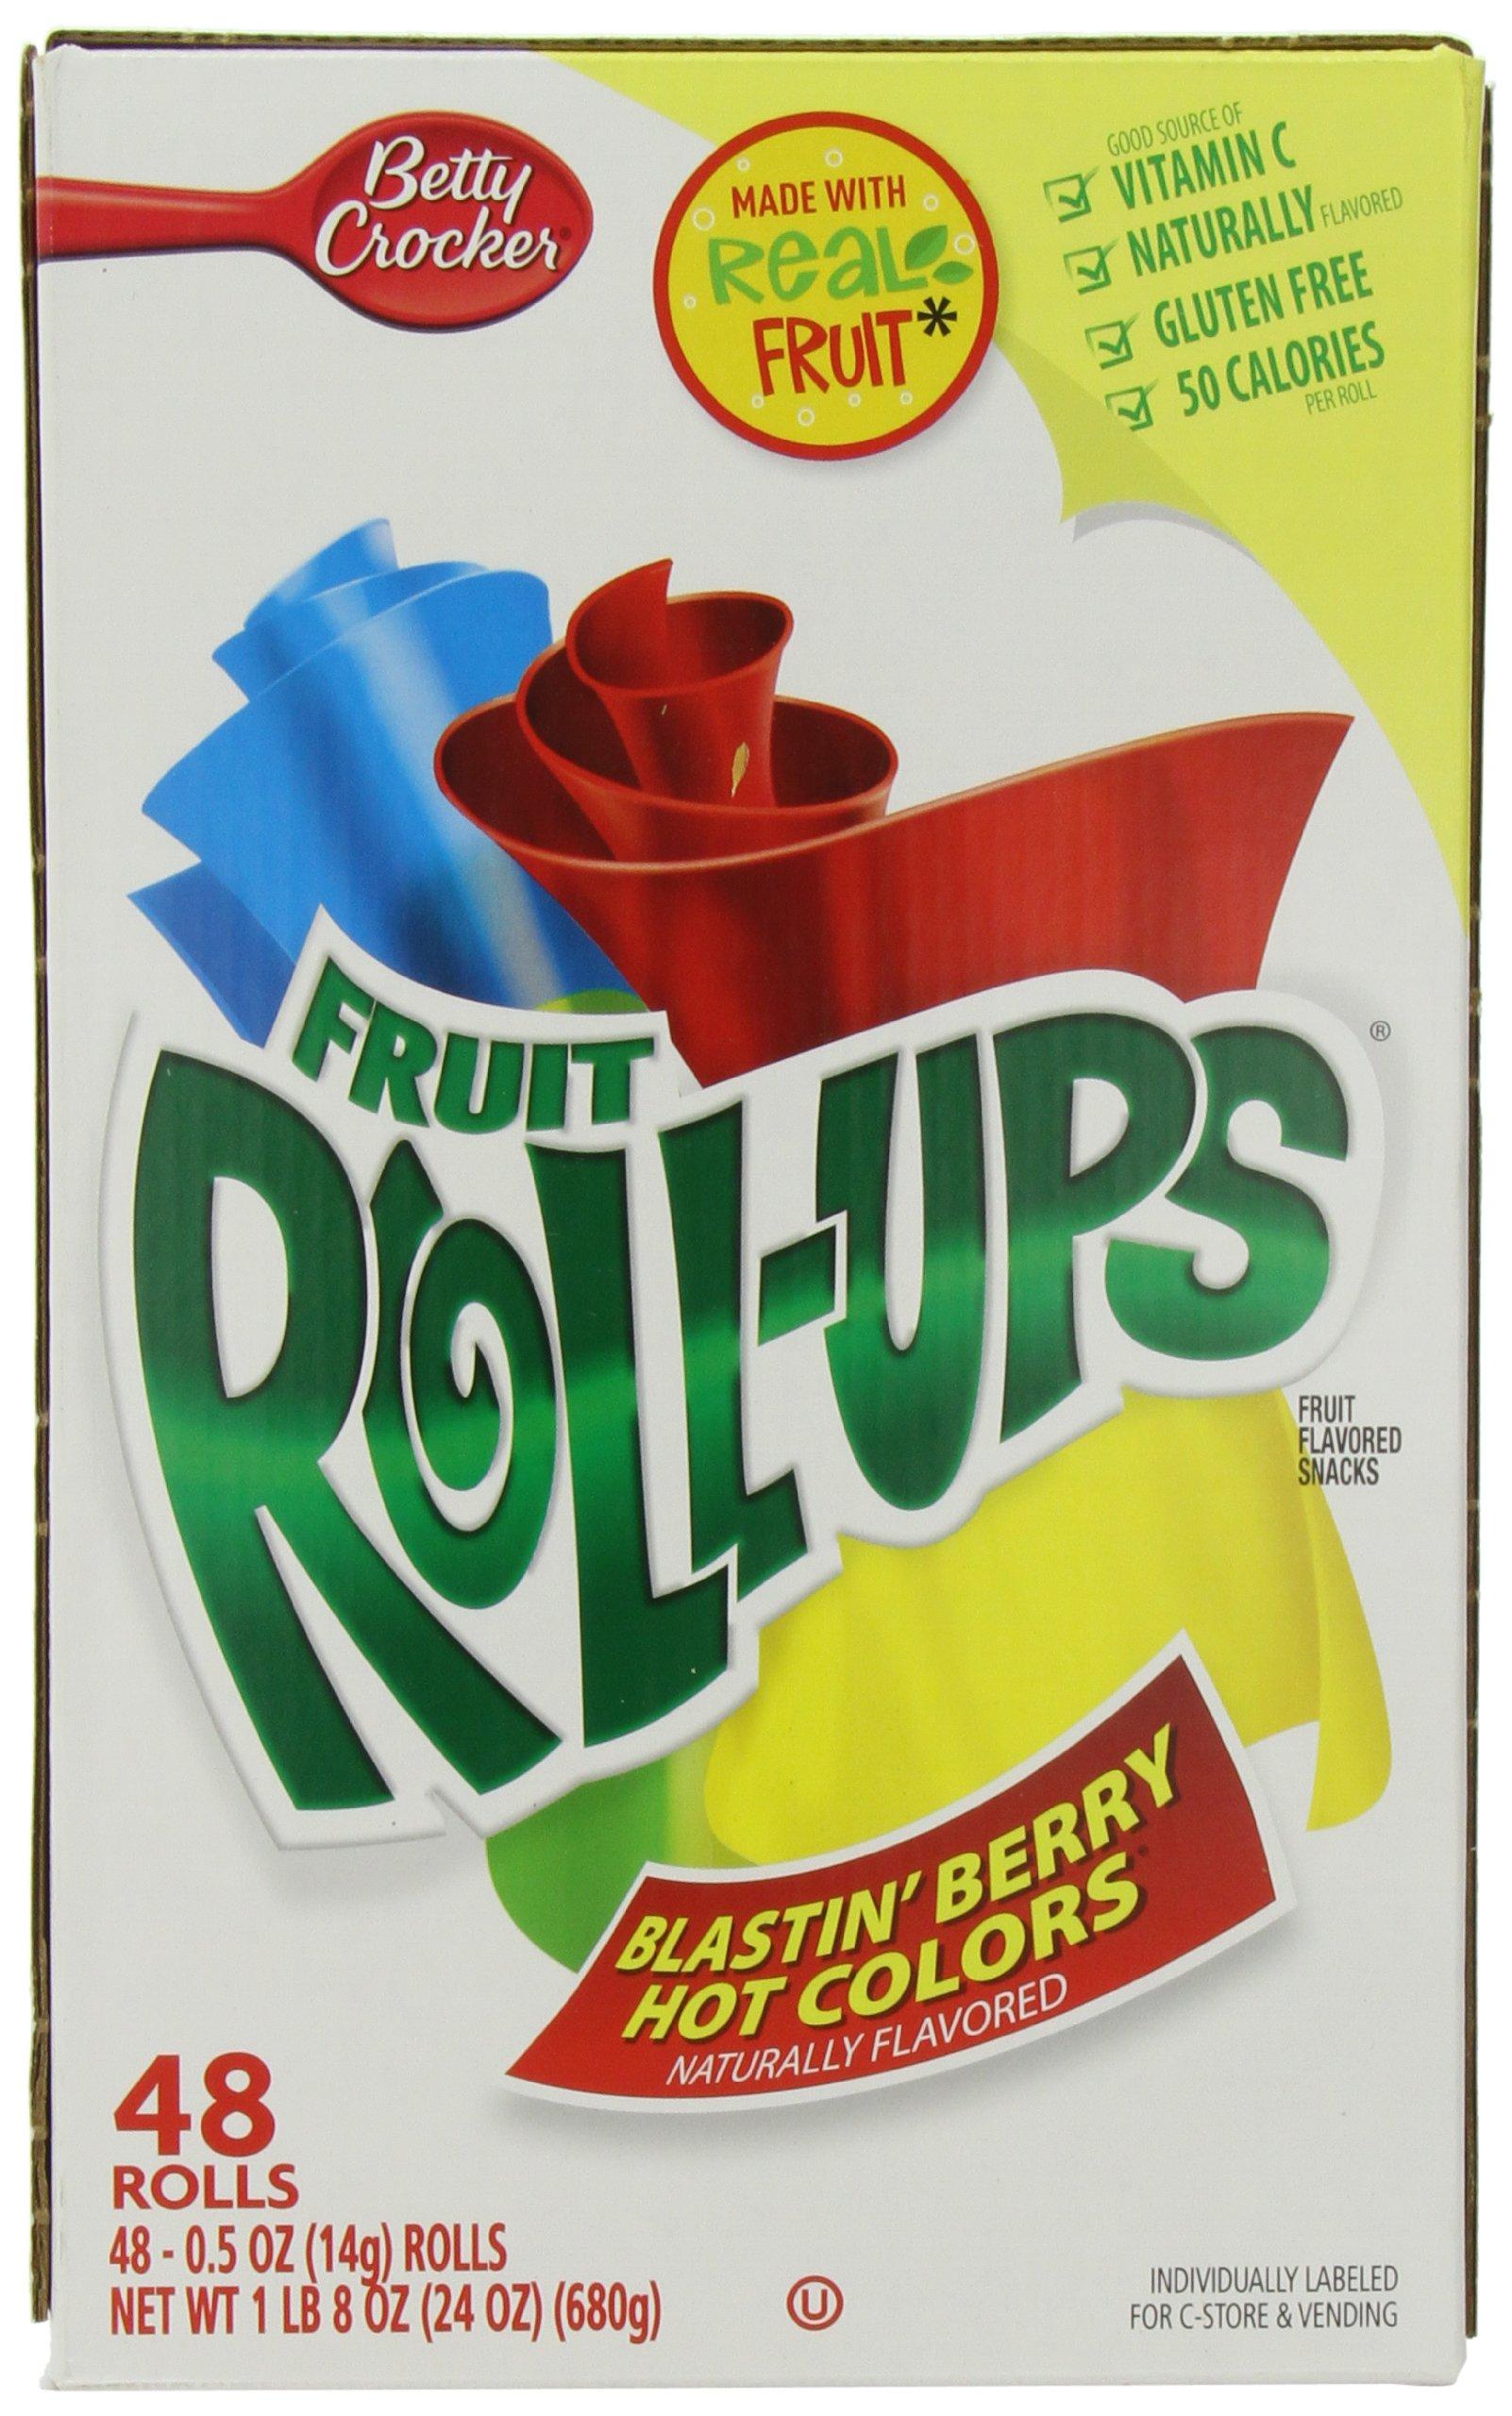 Betty Crocker General Mills Fruit Roll Ups, 48 Count